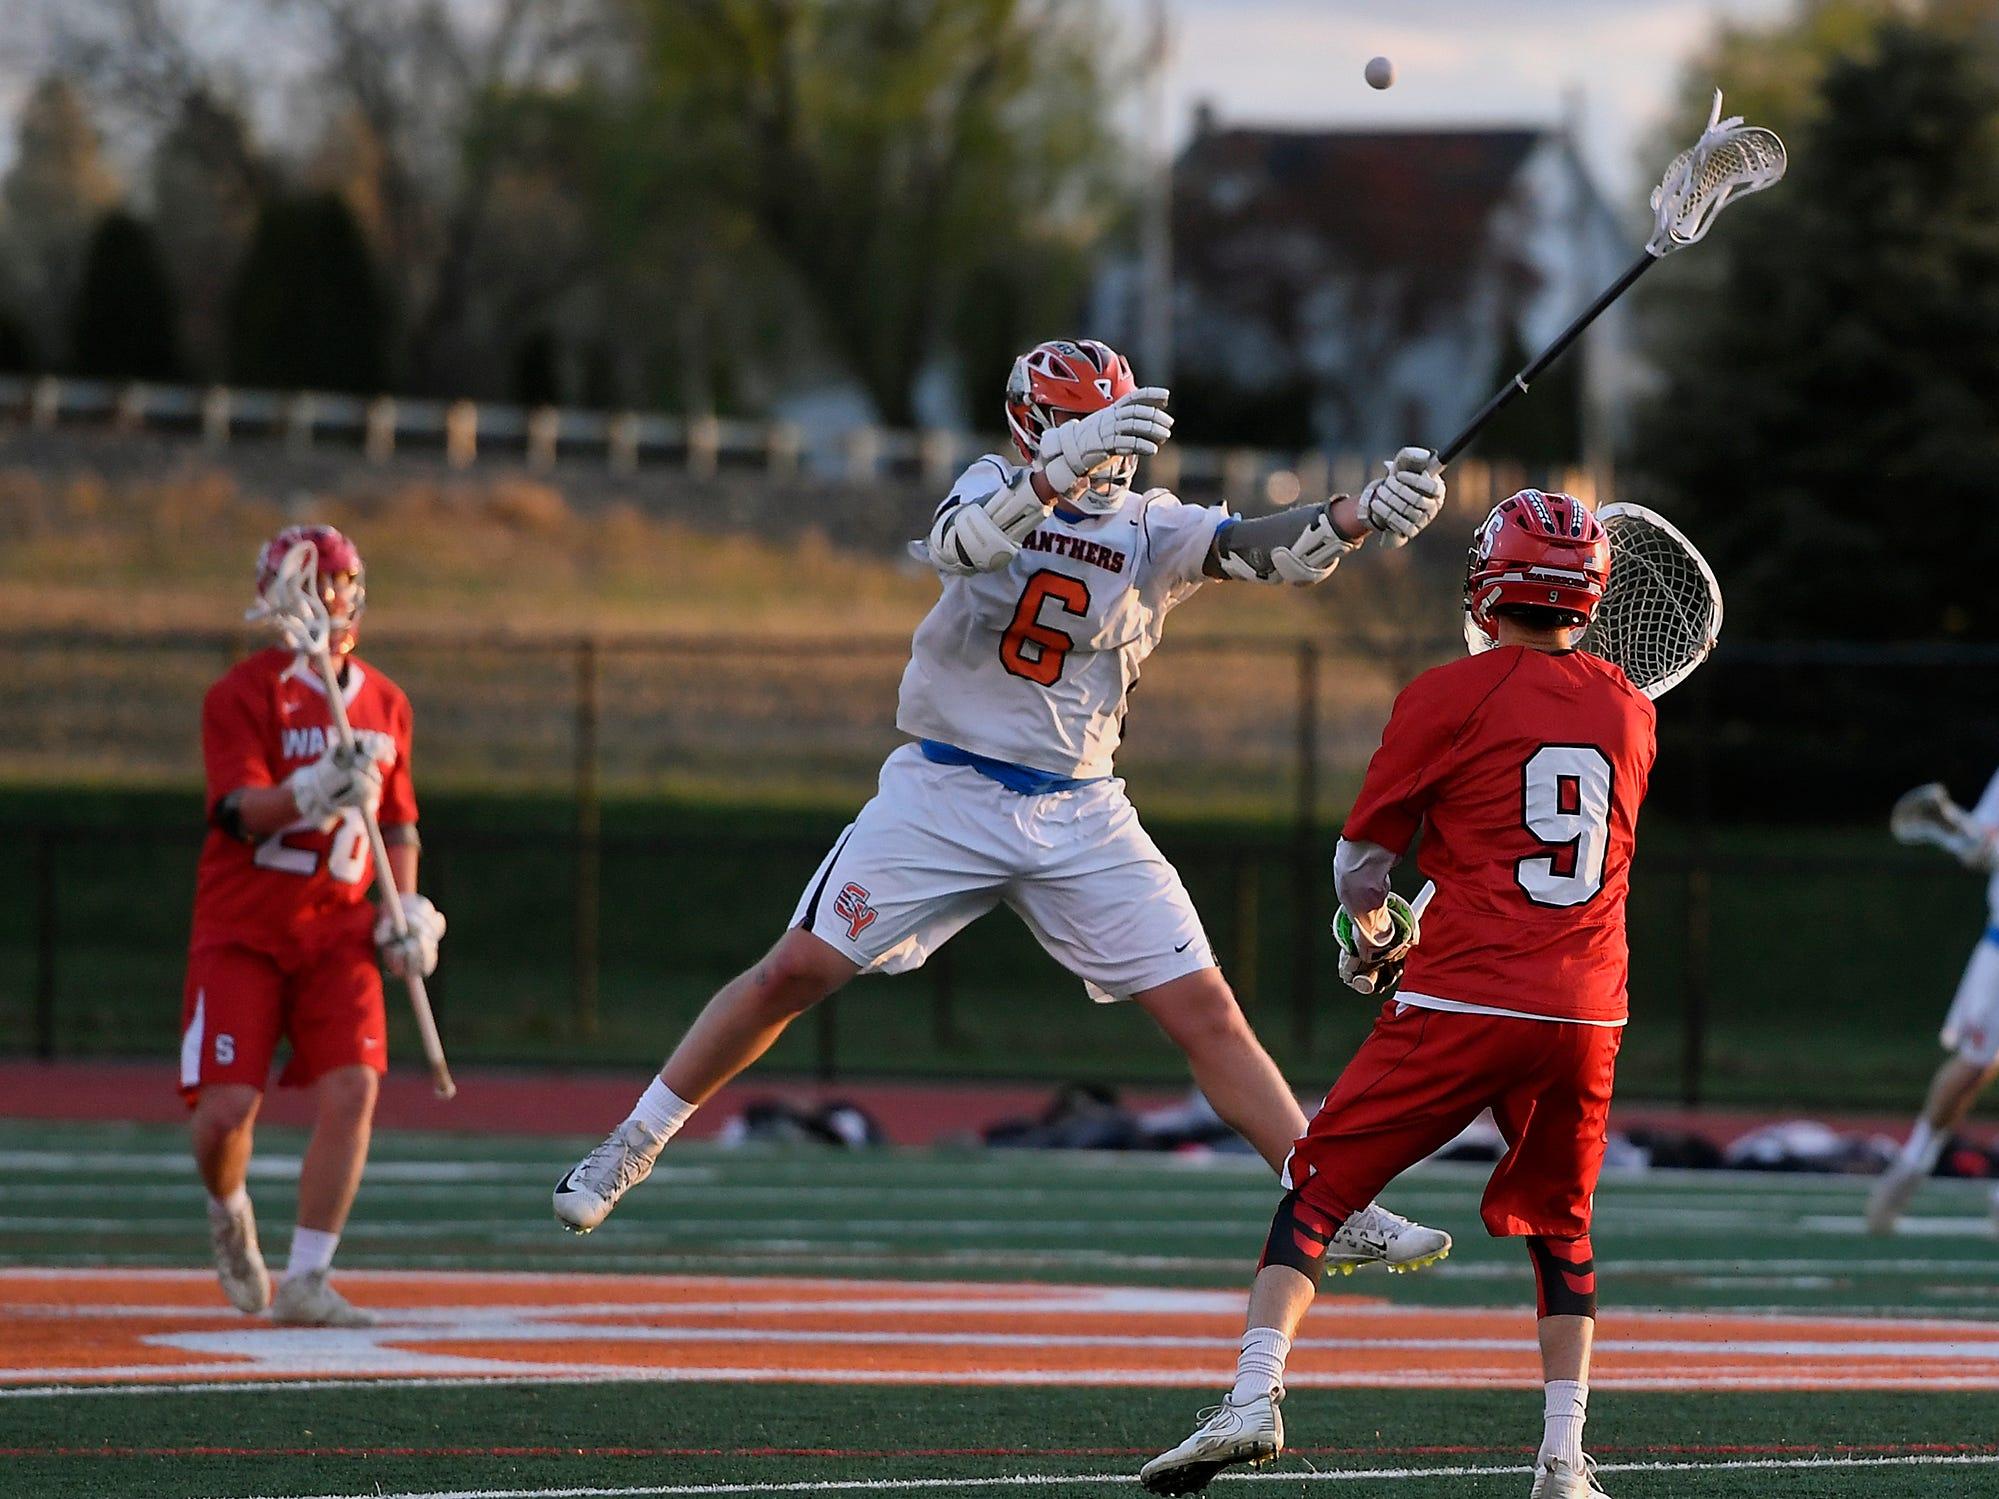 Ryan Kilgour of Central York makes a leaping attempt to block a pass by Connor Kernan of Susquehannock, Monday, April 15, 2019.John A. Pavoncello photo